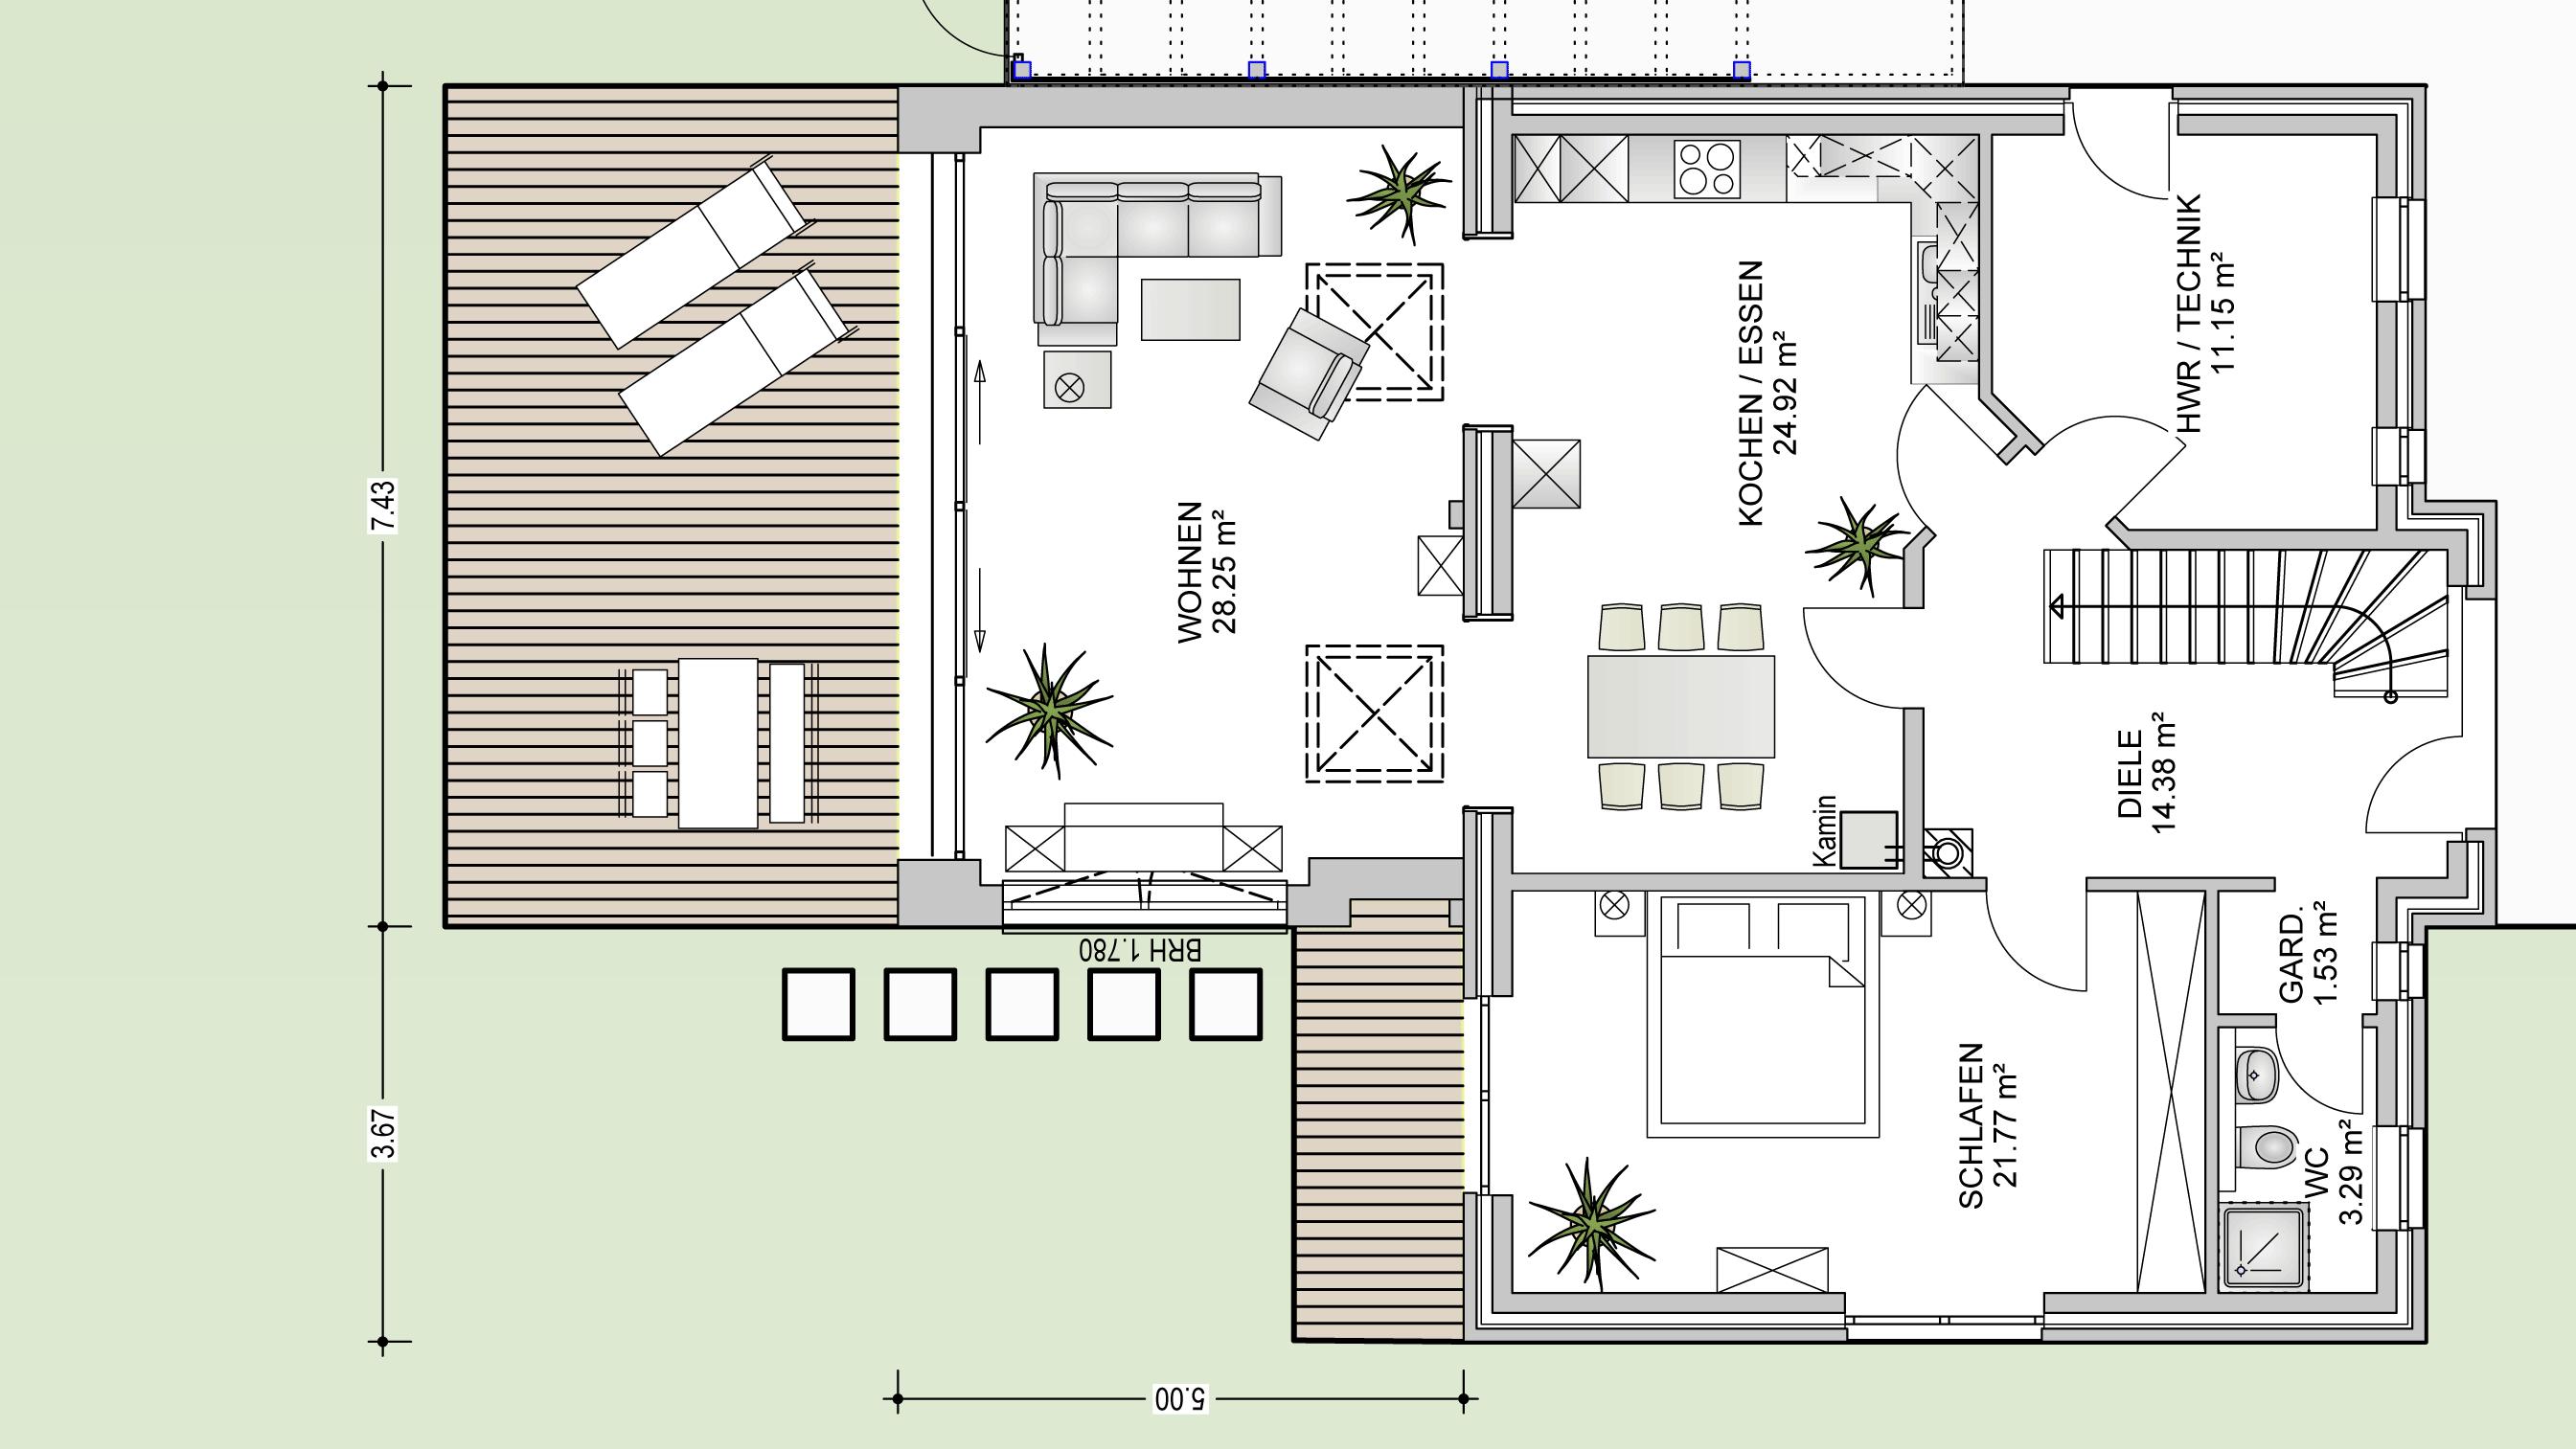 Moderner anbau in radbruch bei l neburg hochplan for Anbau haus modern